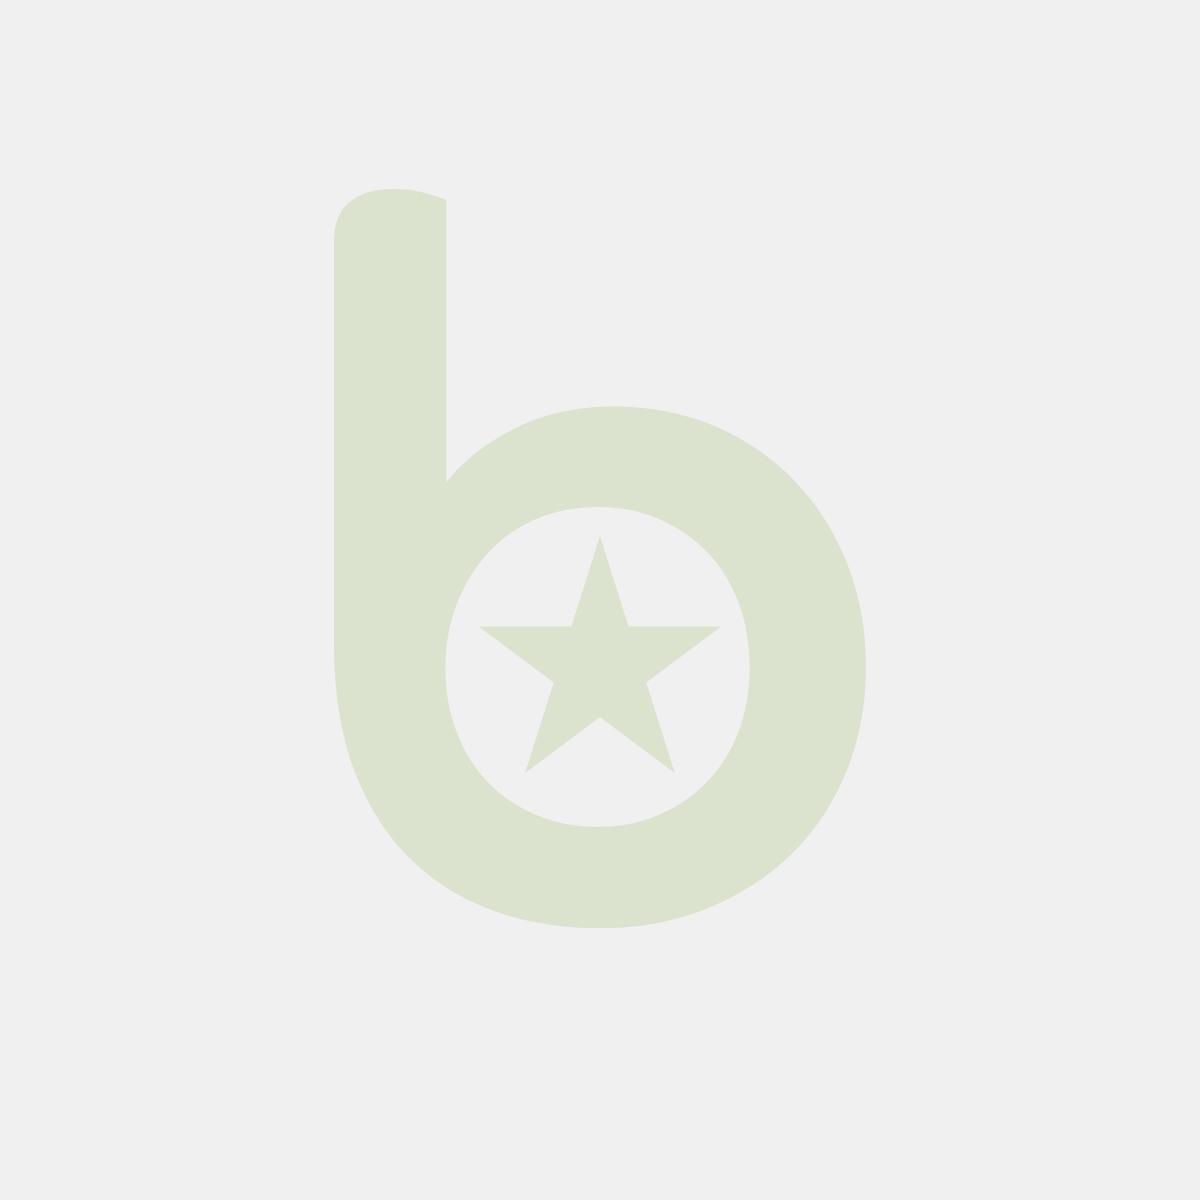 Flipchart mobilny Nobo Classic (Barracuda), 67,5x100cm, tablica suchoś. -magn.